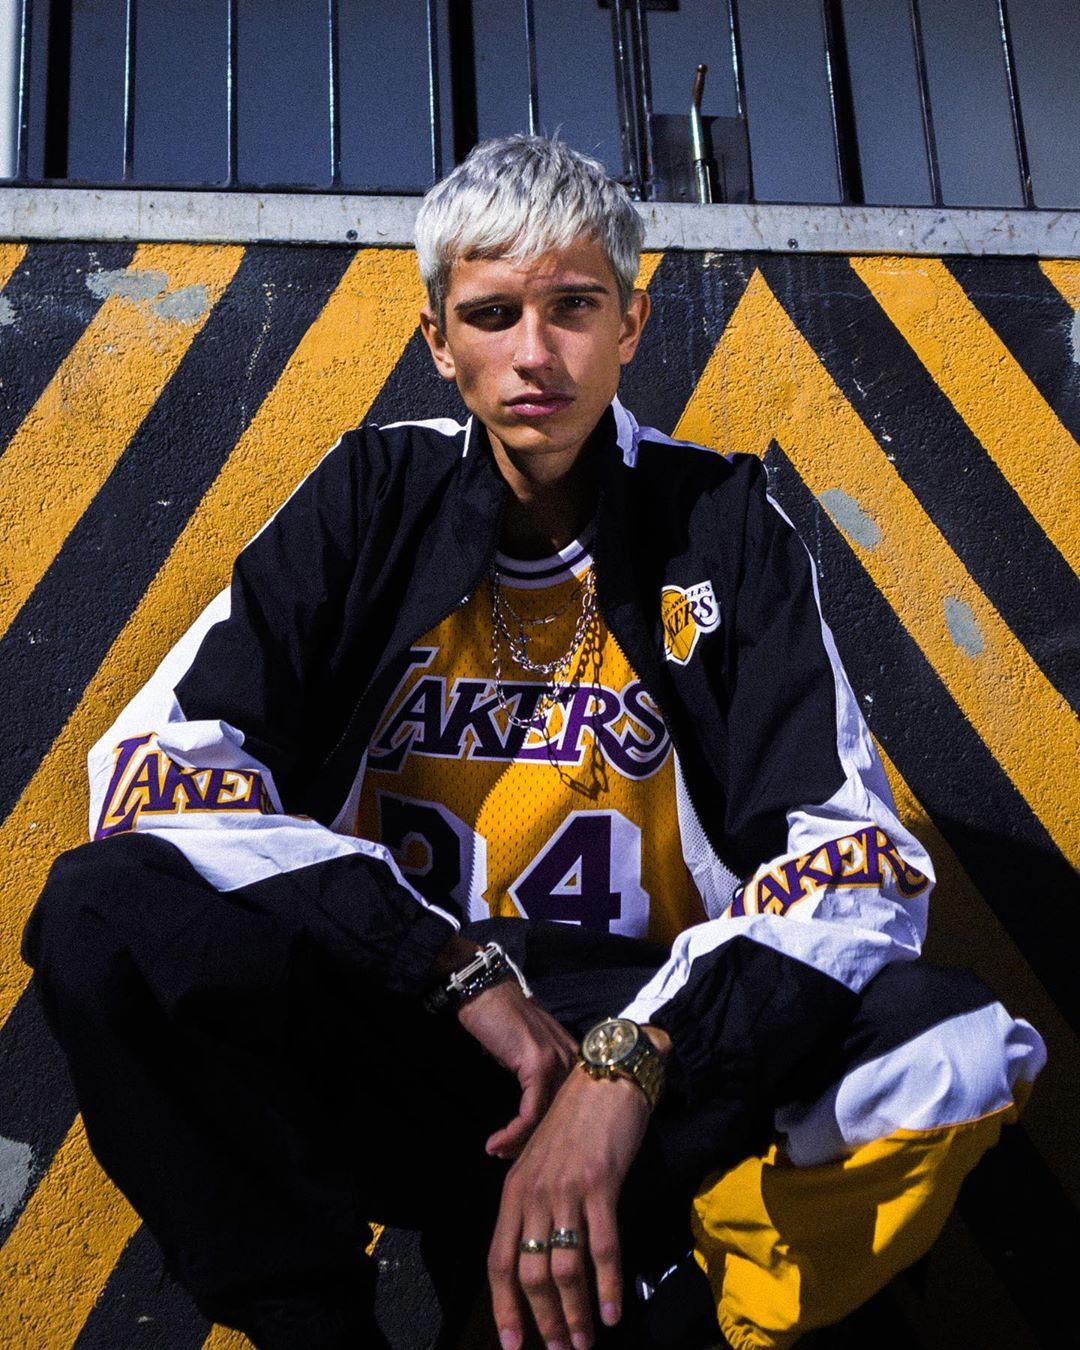 Culi Lakers